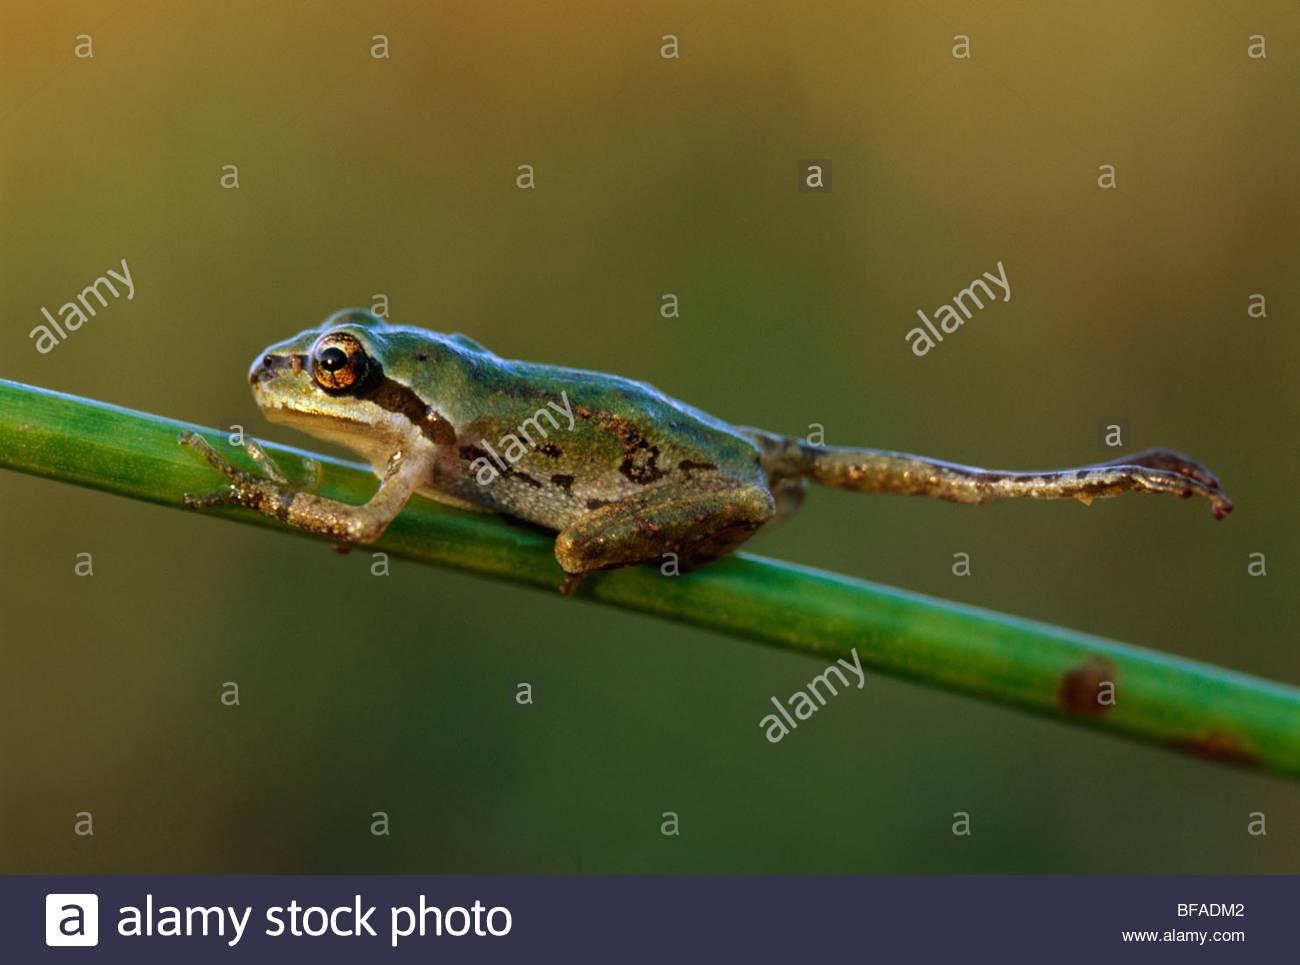 Deformed pacific tree frog, Hyla regilla, Wilson State Reserve, Oregon - Stock Image